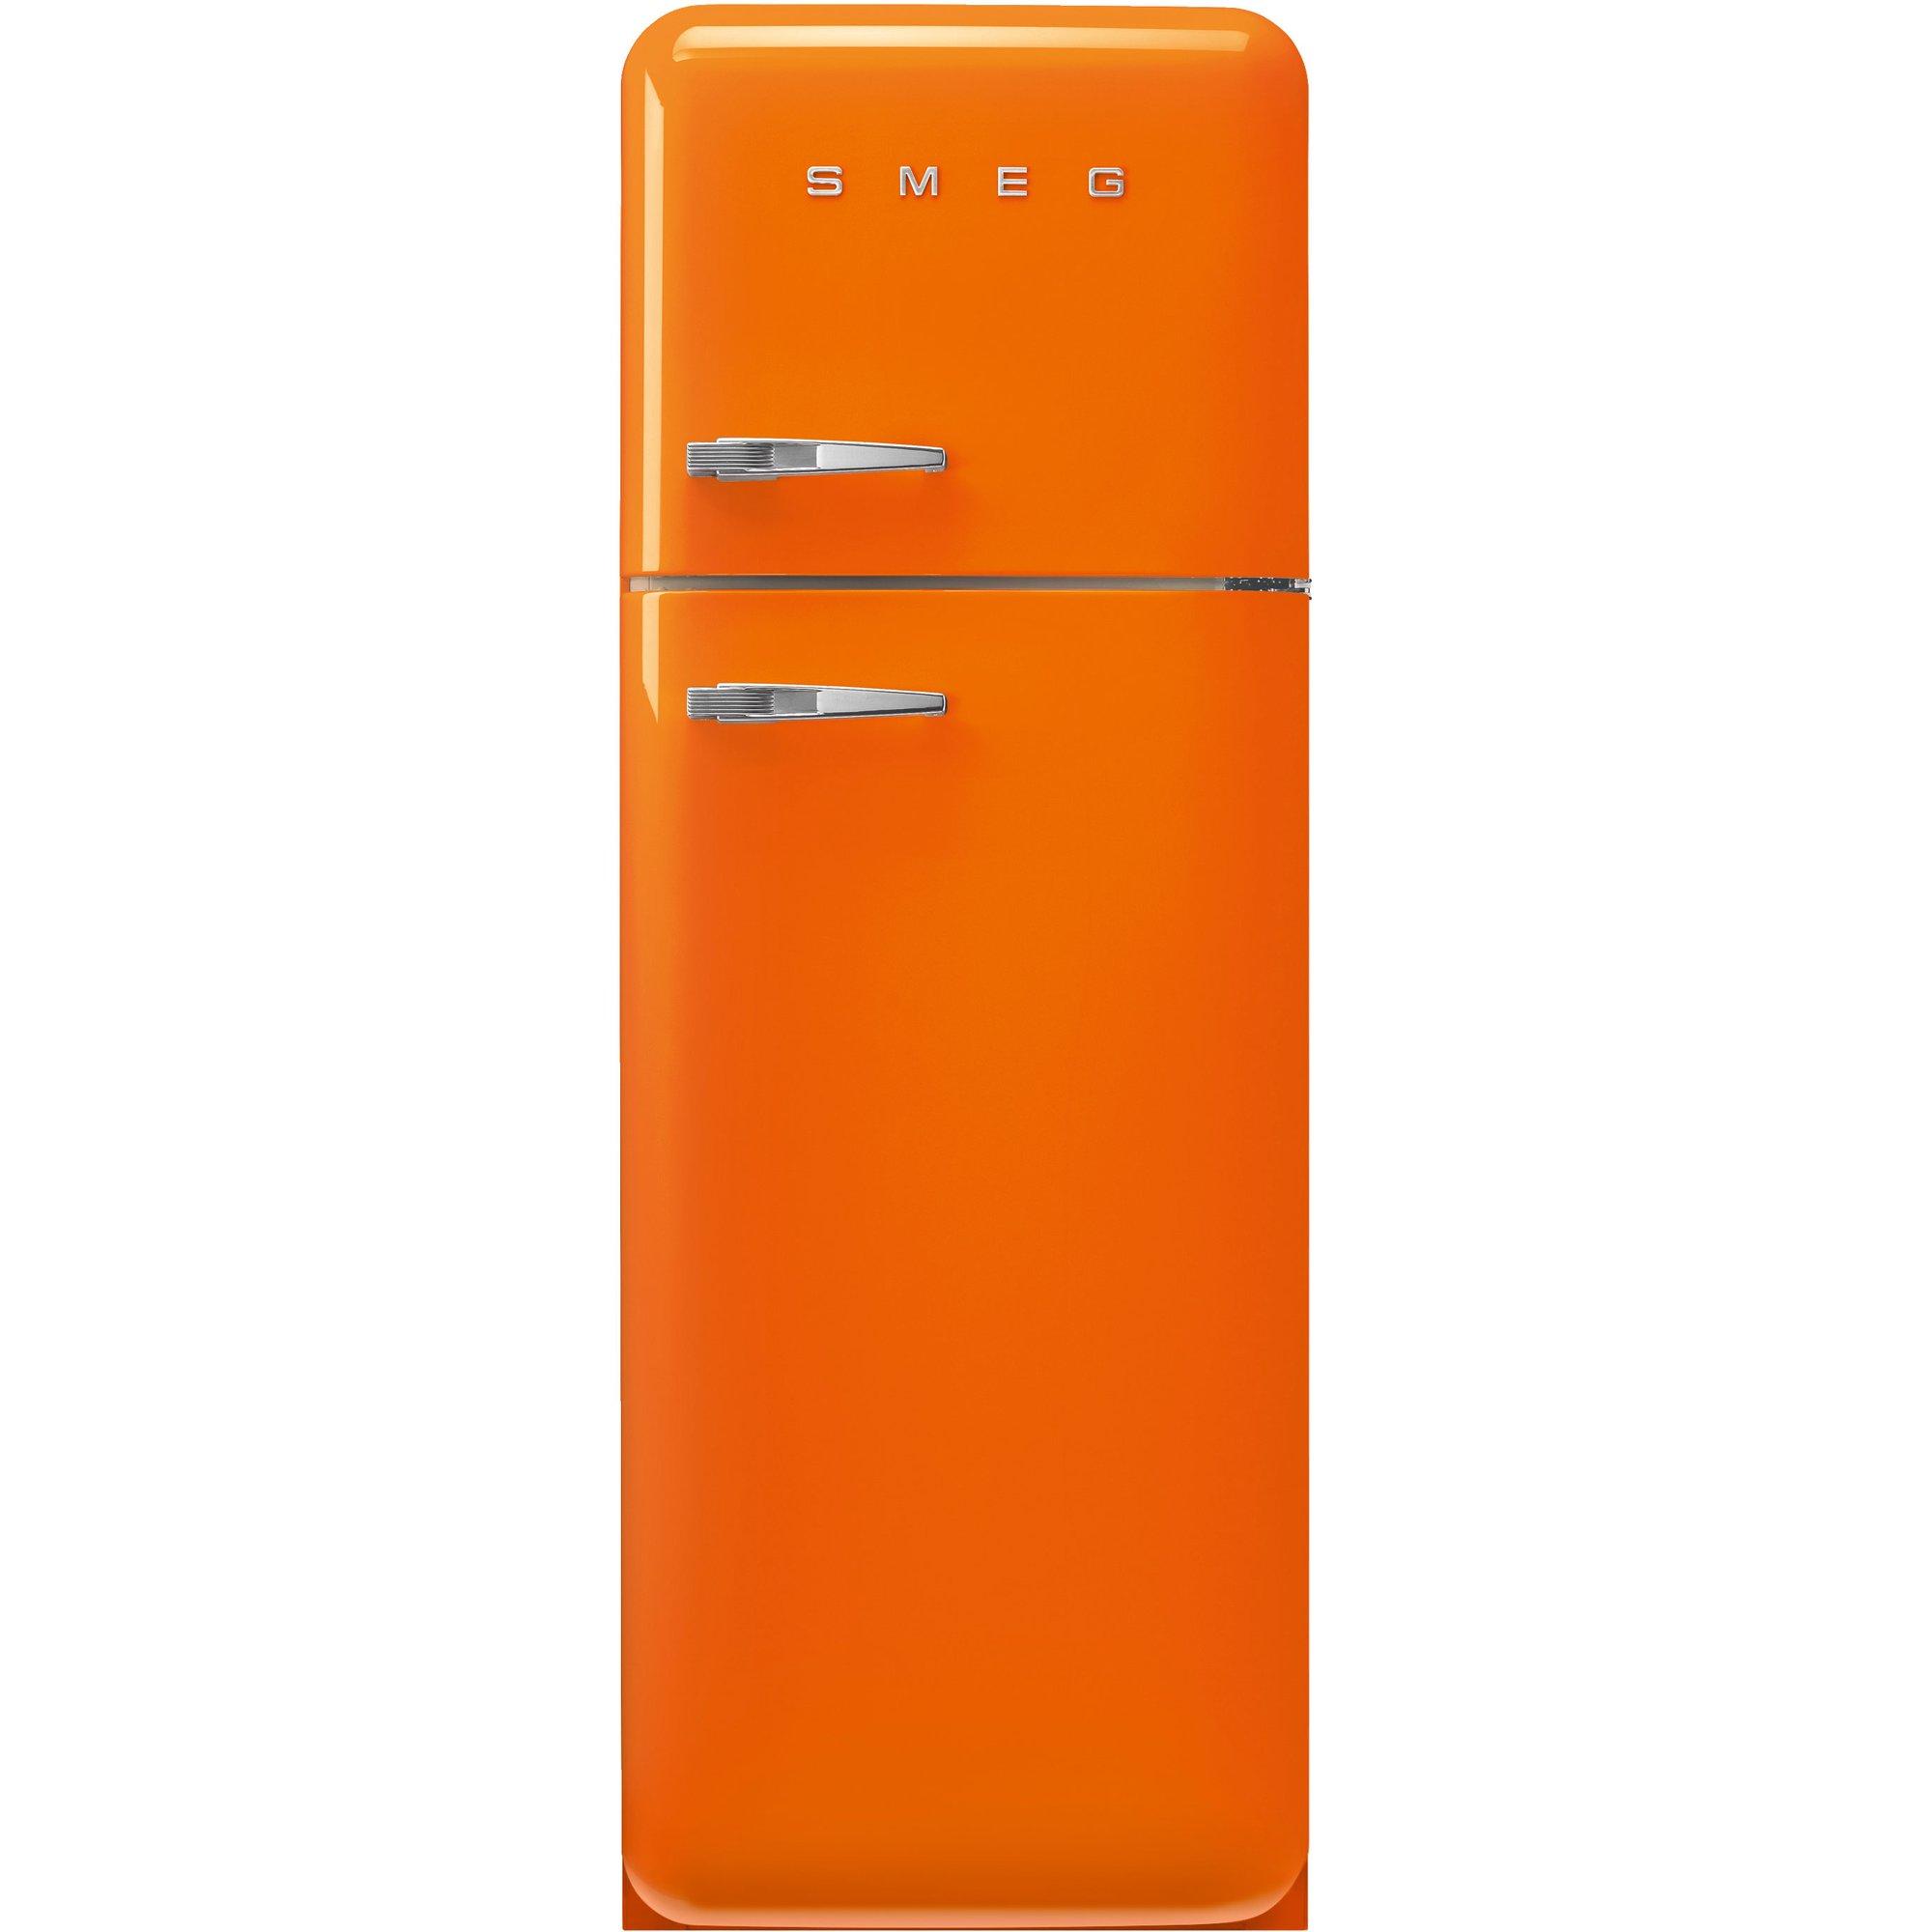 Smeg FAB30ROR5 Køle-/fryseskab orange